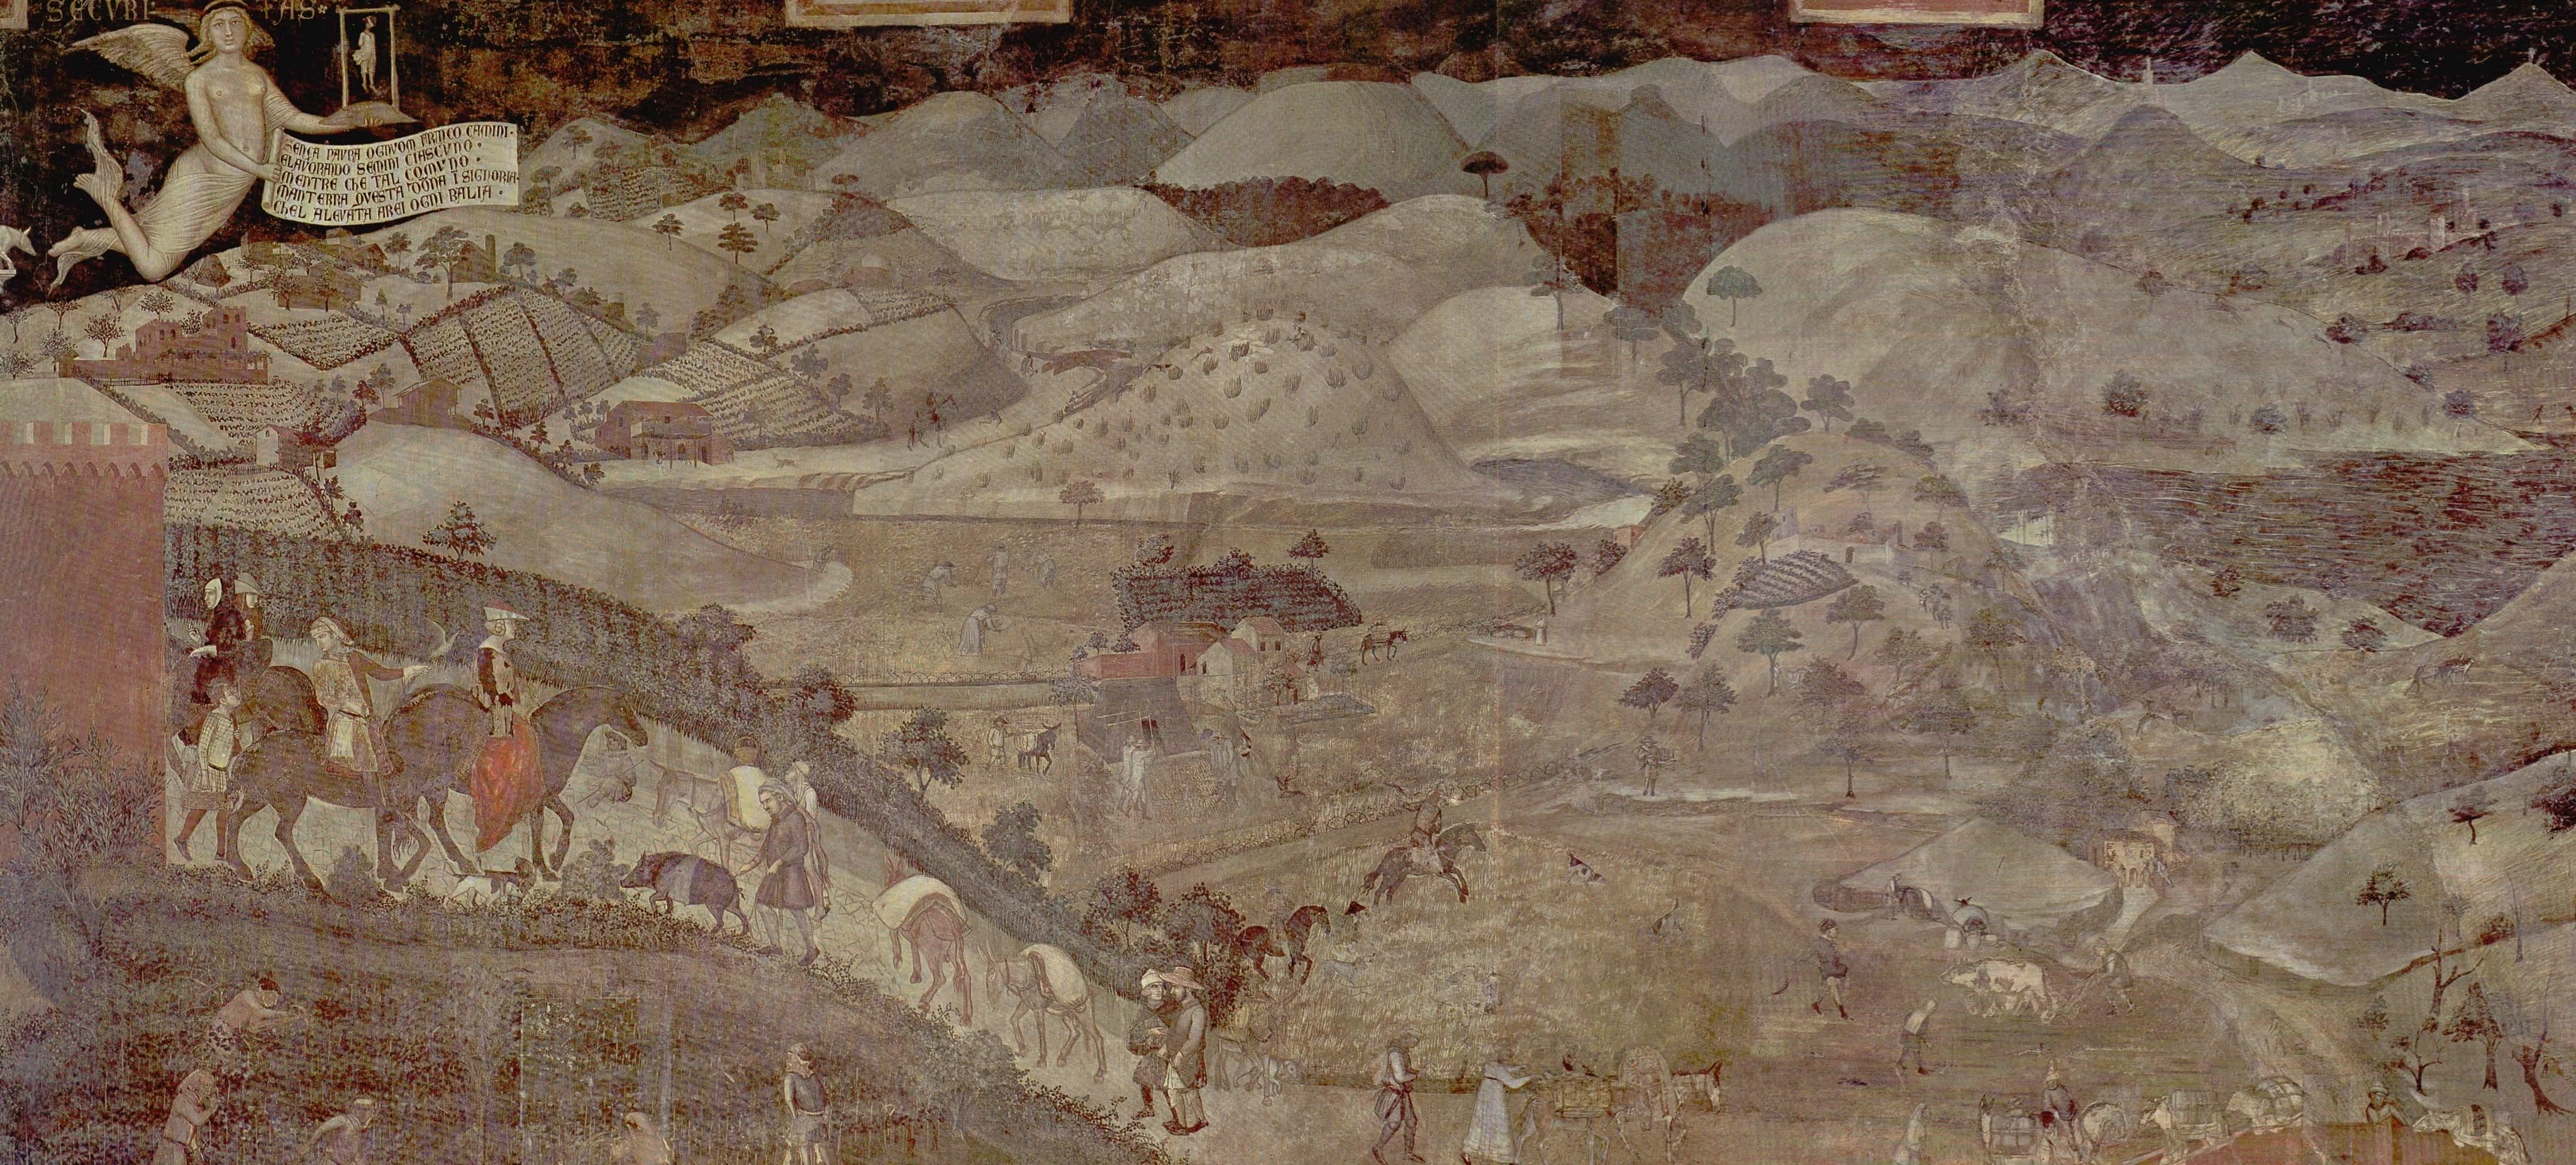 Ambrogio Lorenzetti 011.jpg